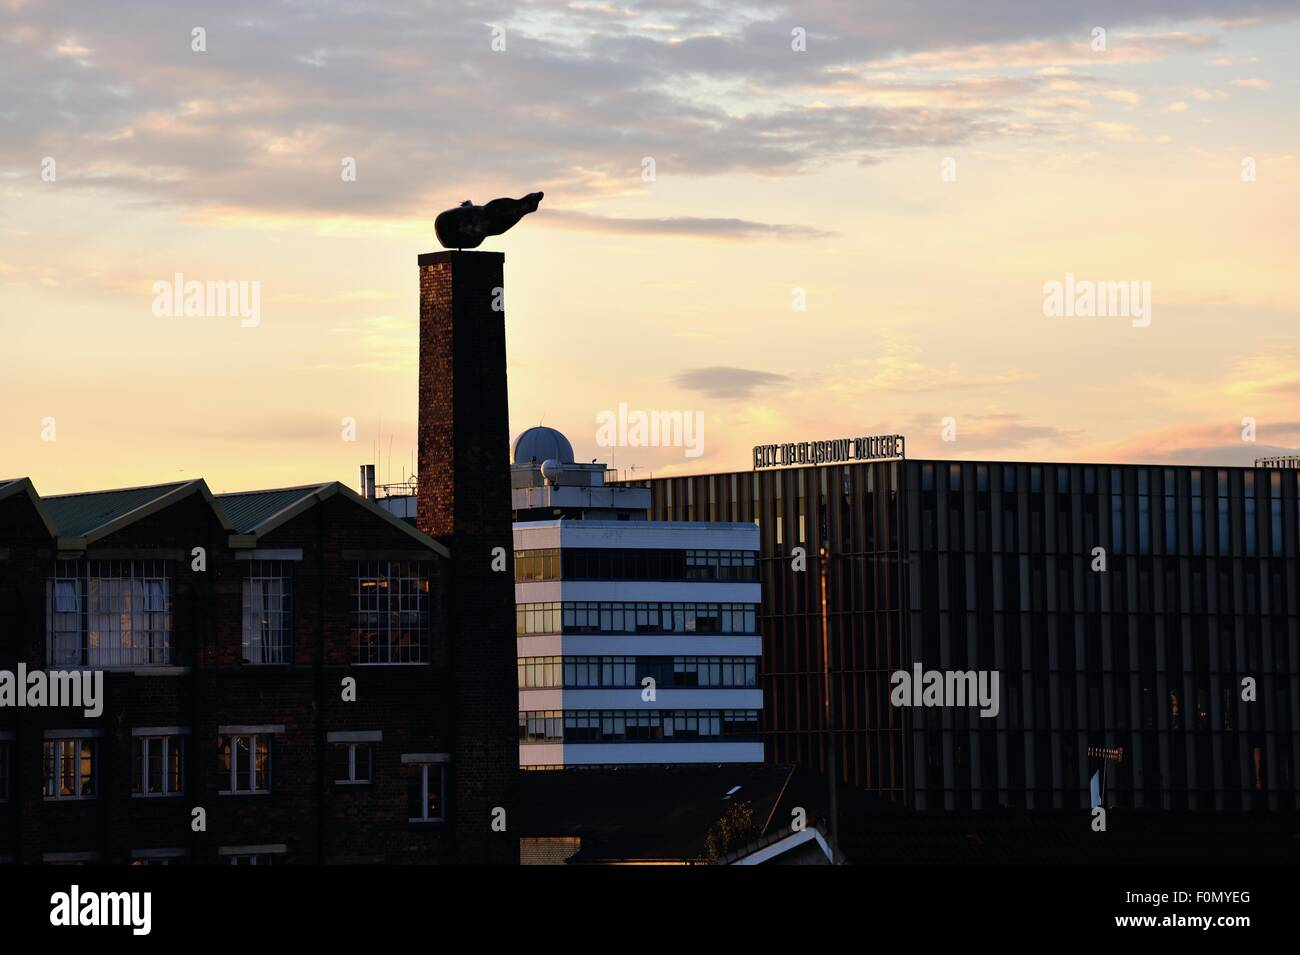 Glasgow, Scotland, UK. 18th August, 2015. Glasgow City College's new riverside campus adds to the Glasgow skyline Stock Photo